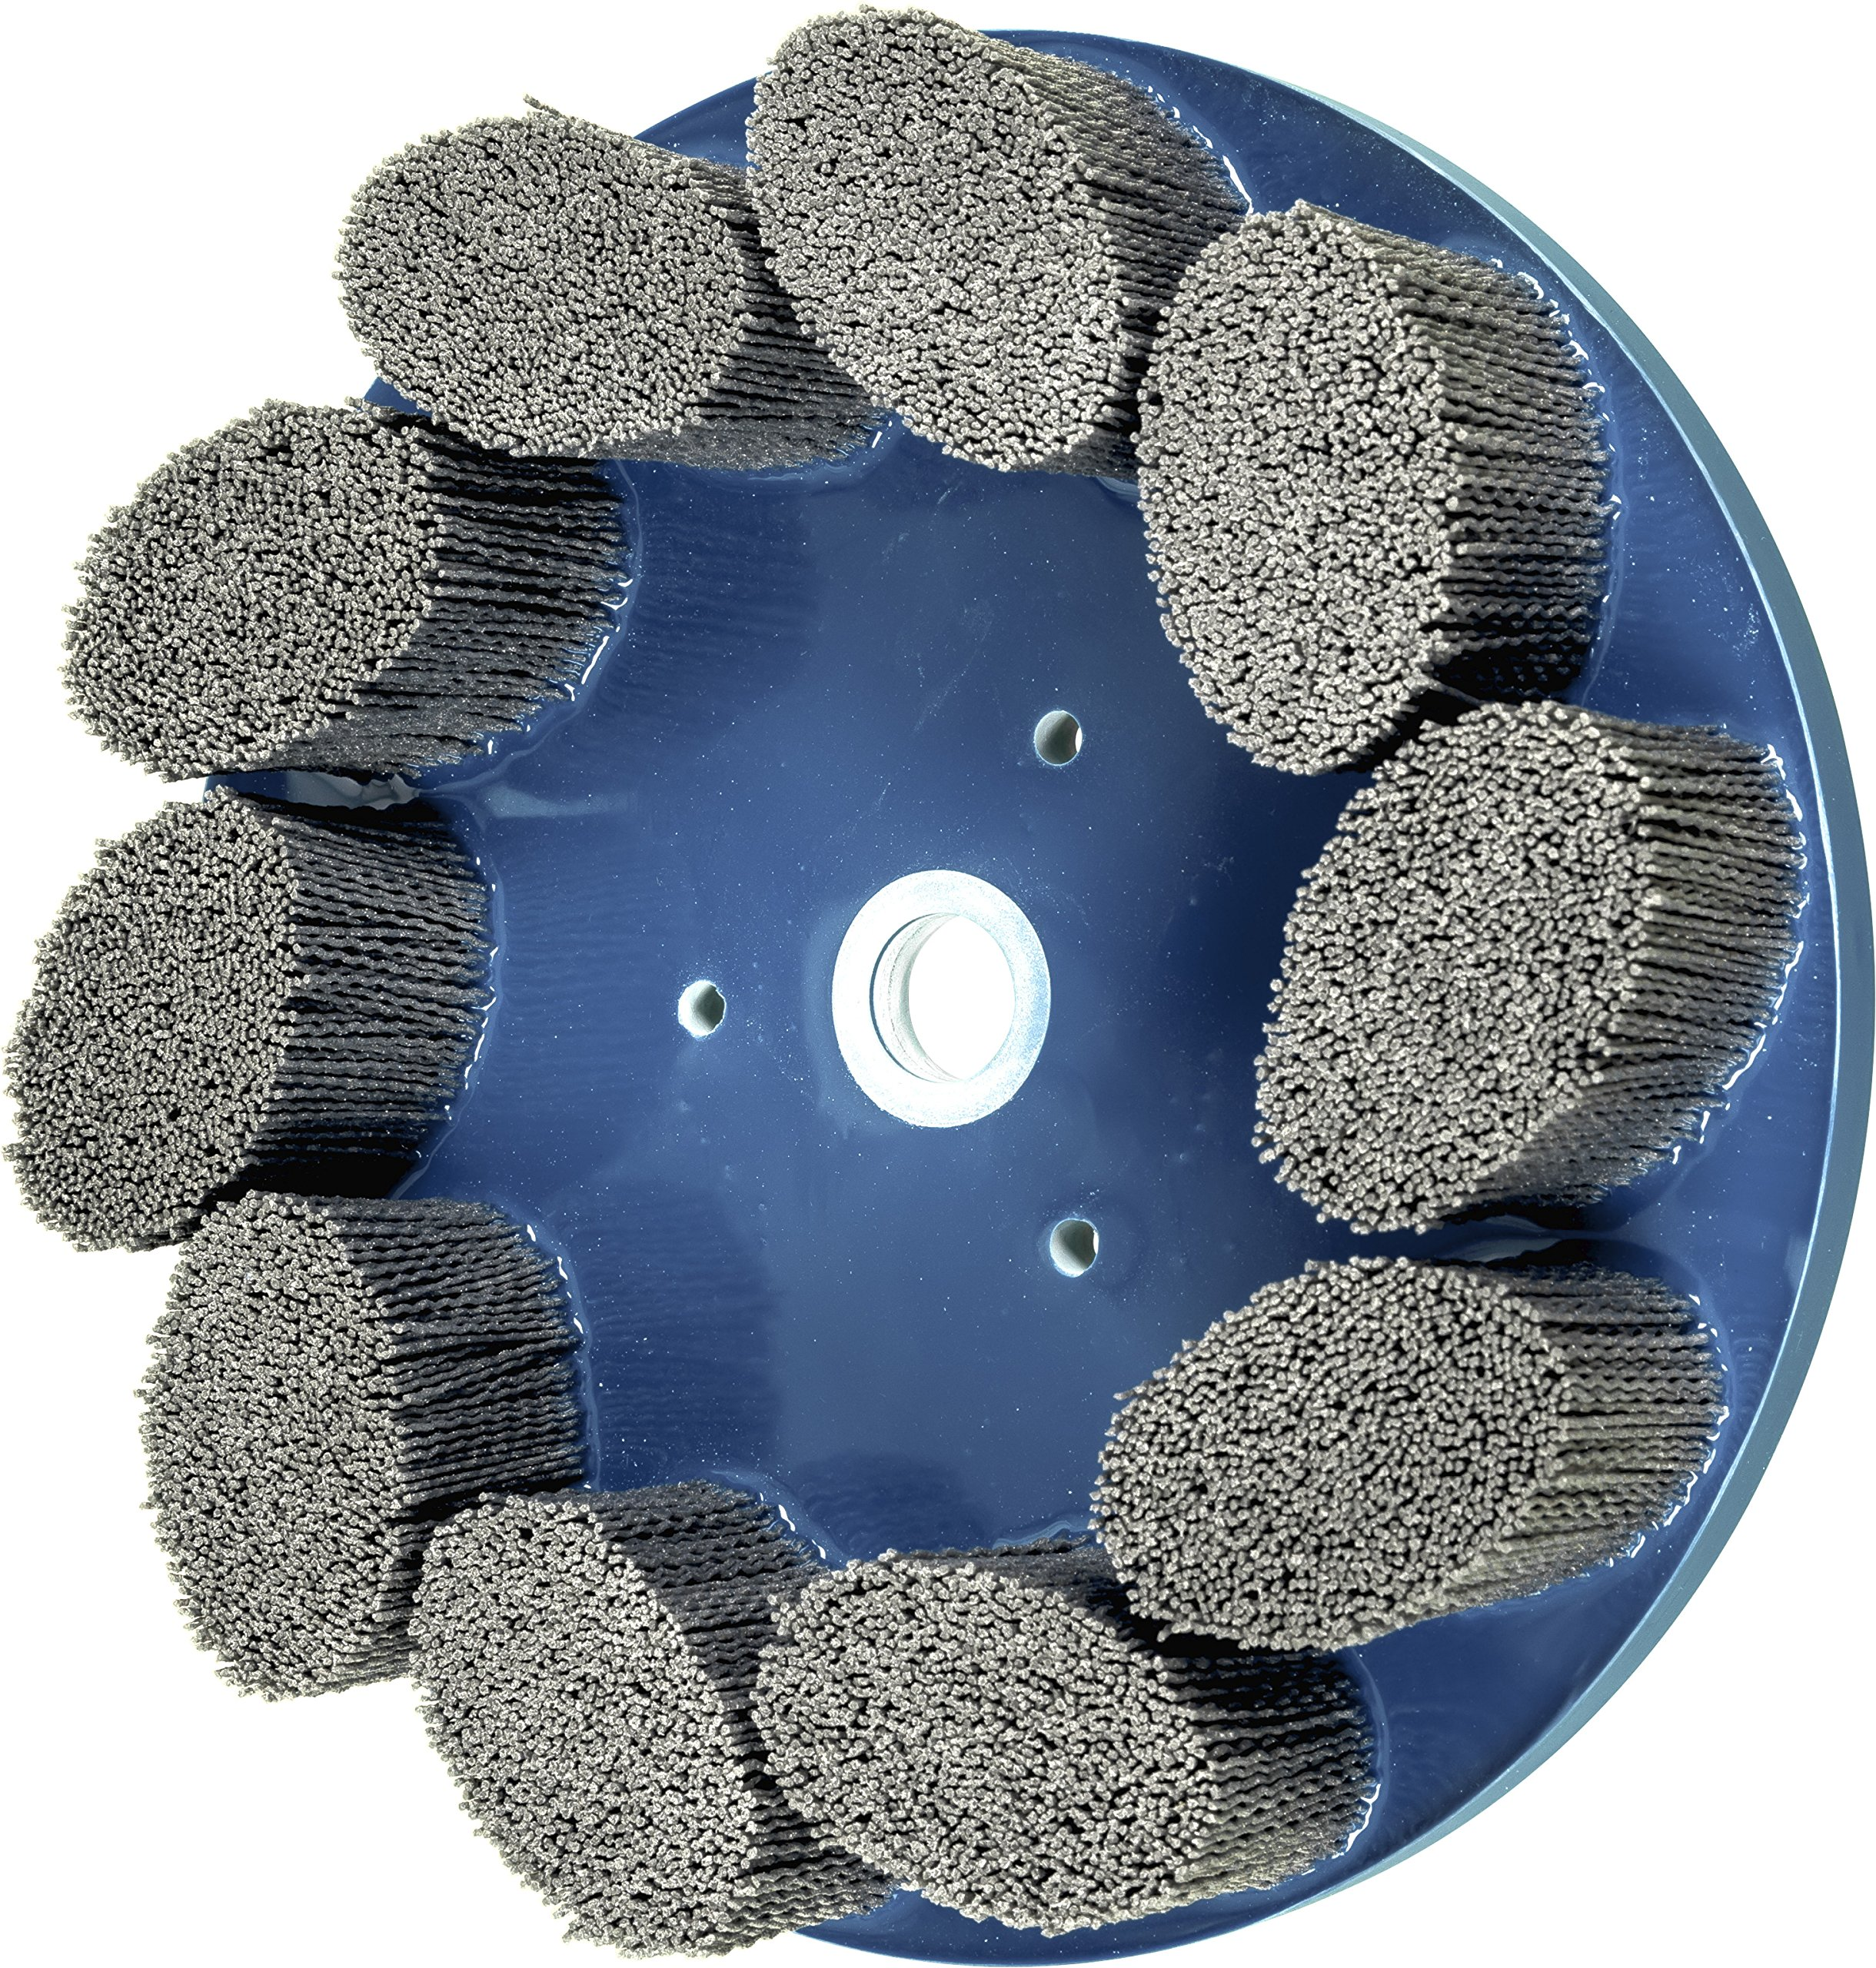 PFERD 83957 M-Brad Standard Density Composite Disc Brush, Silicon Carbide, 10'' Diameter, .040 Round Filament, 1340 Rpm, 80 Grit, Silicon Carbide, Coating, Cut,, Cutting Angle, Flute,